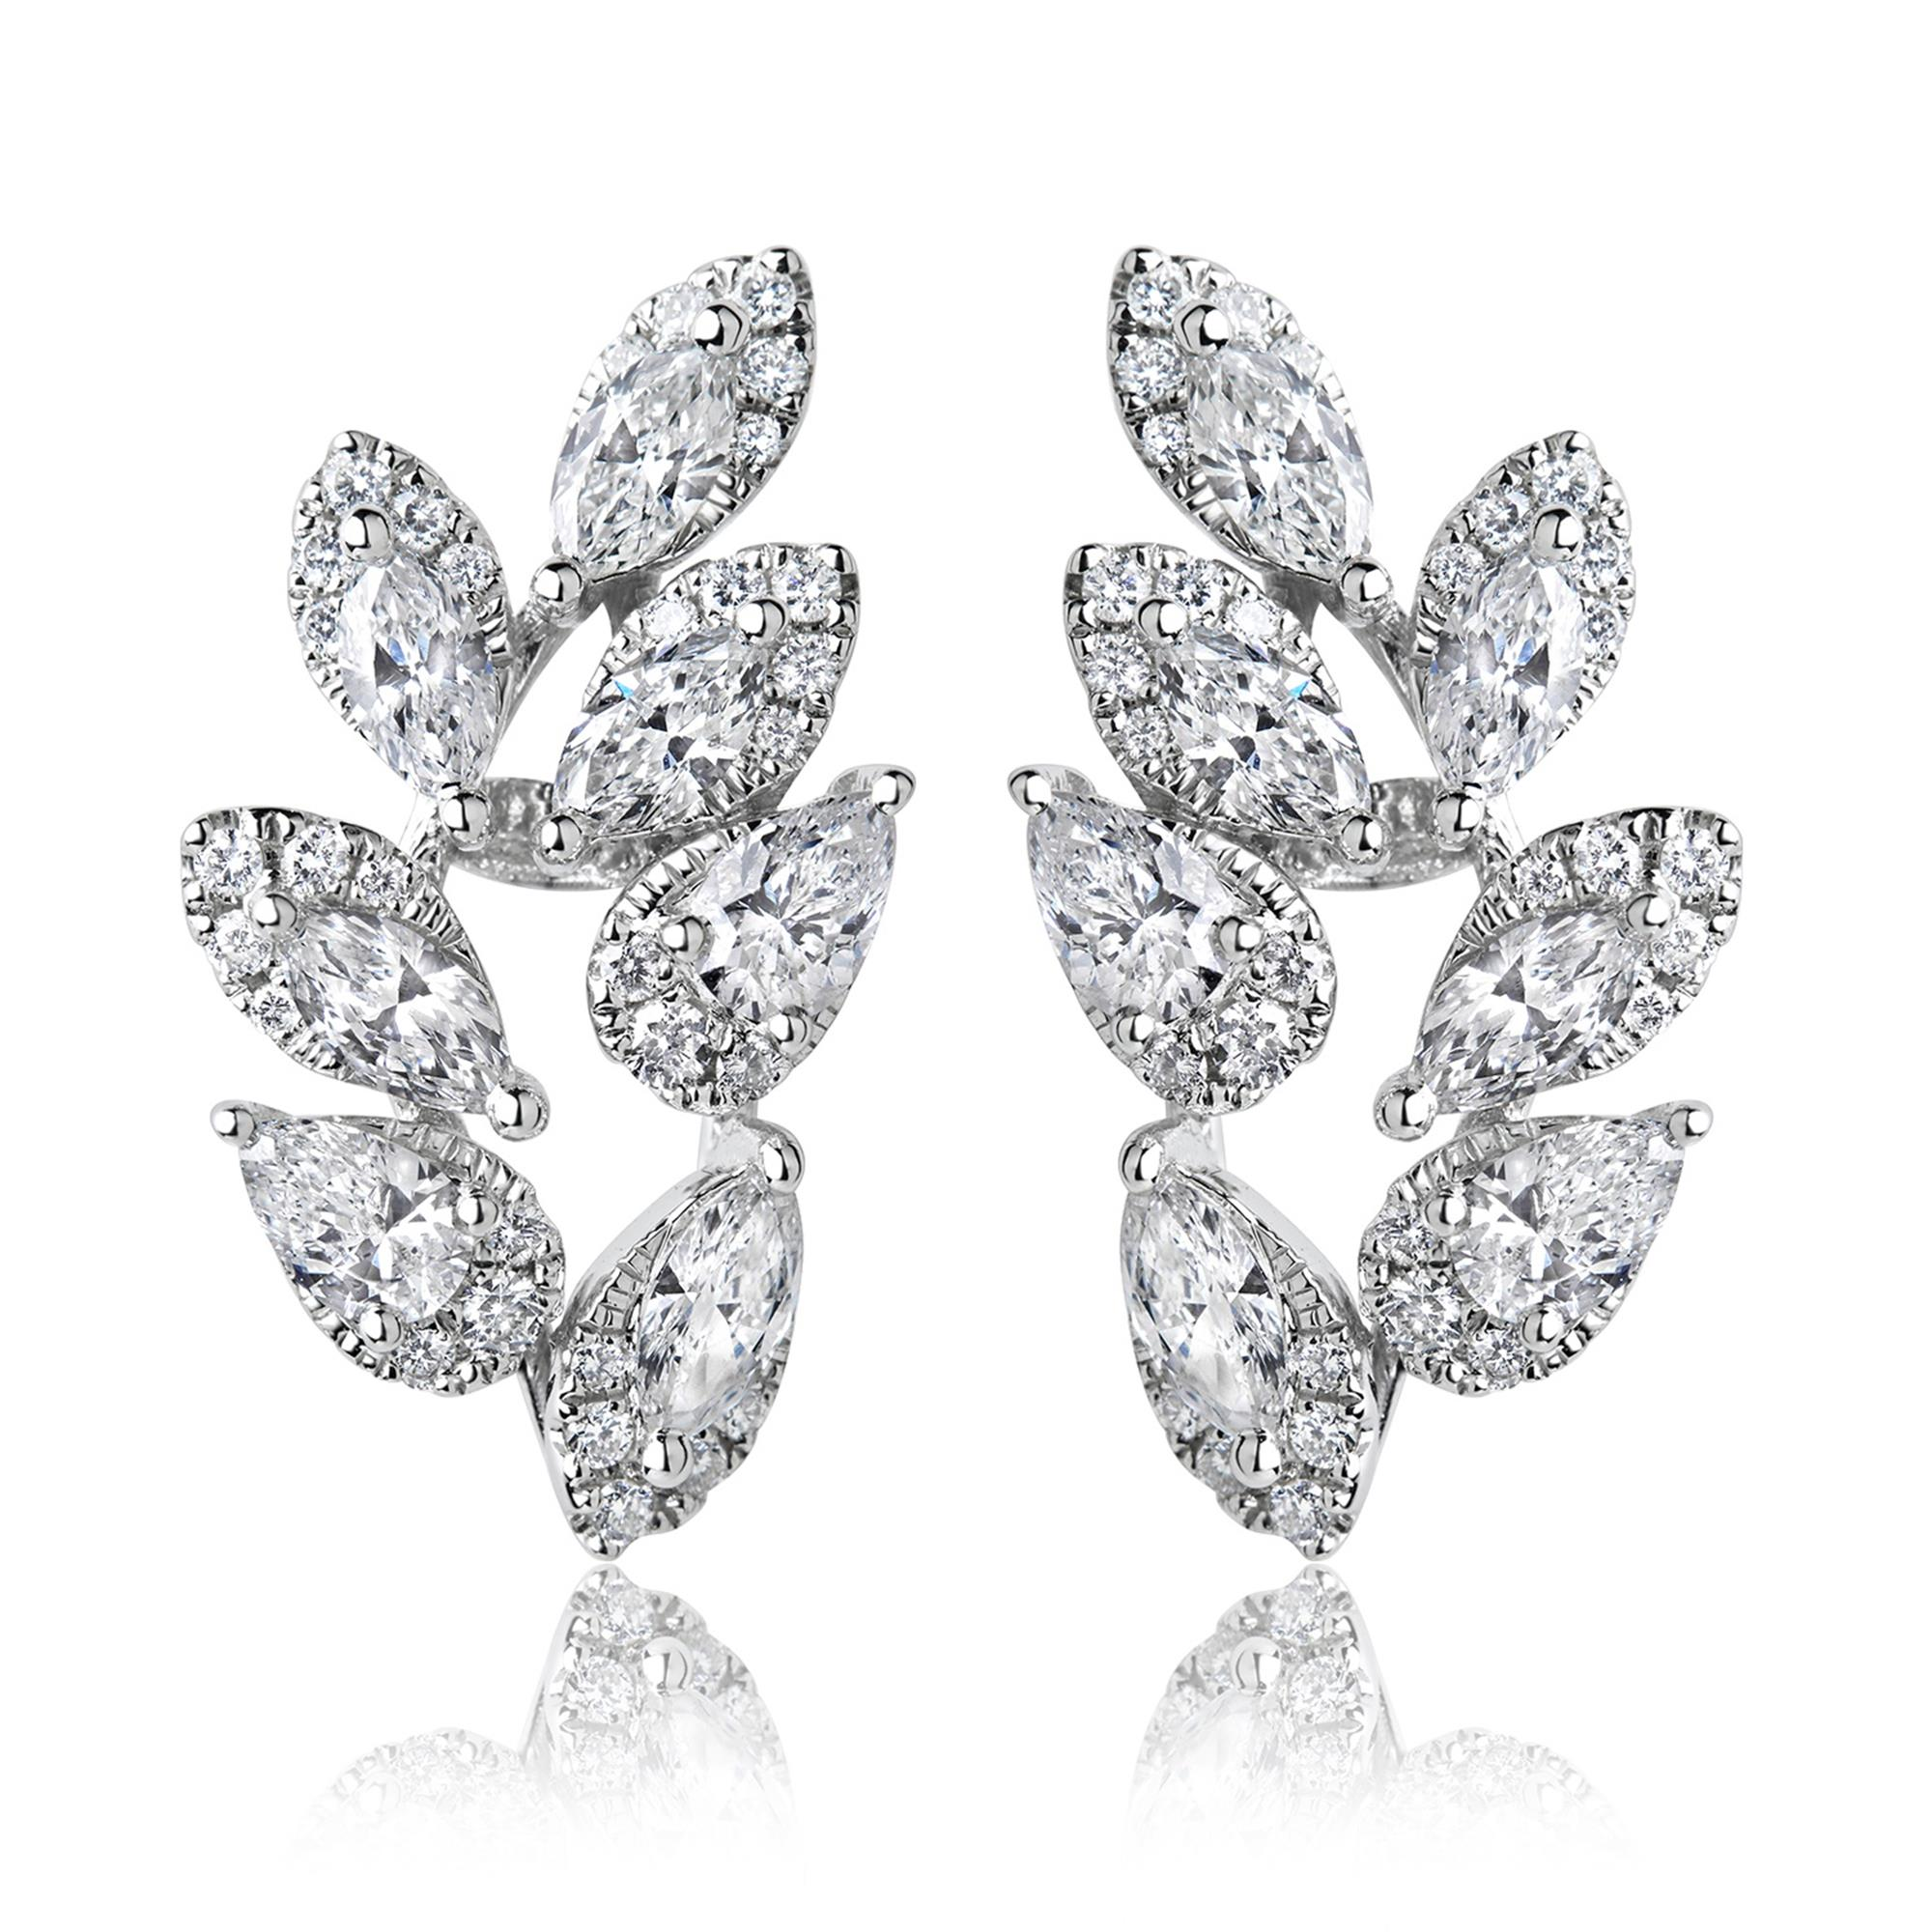 pravins-earrings-diamond-april-birthstone